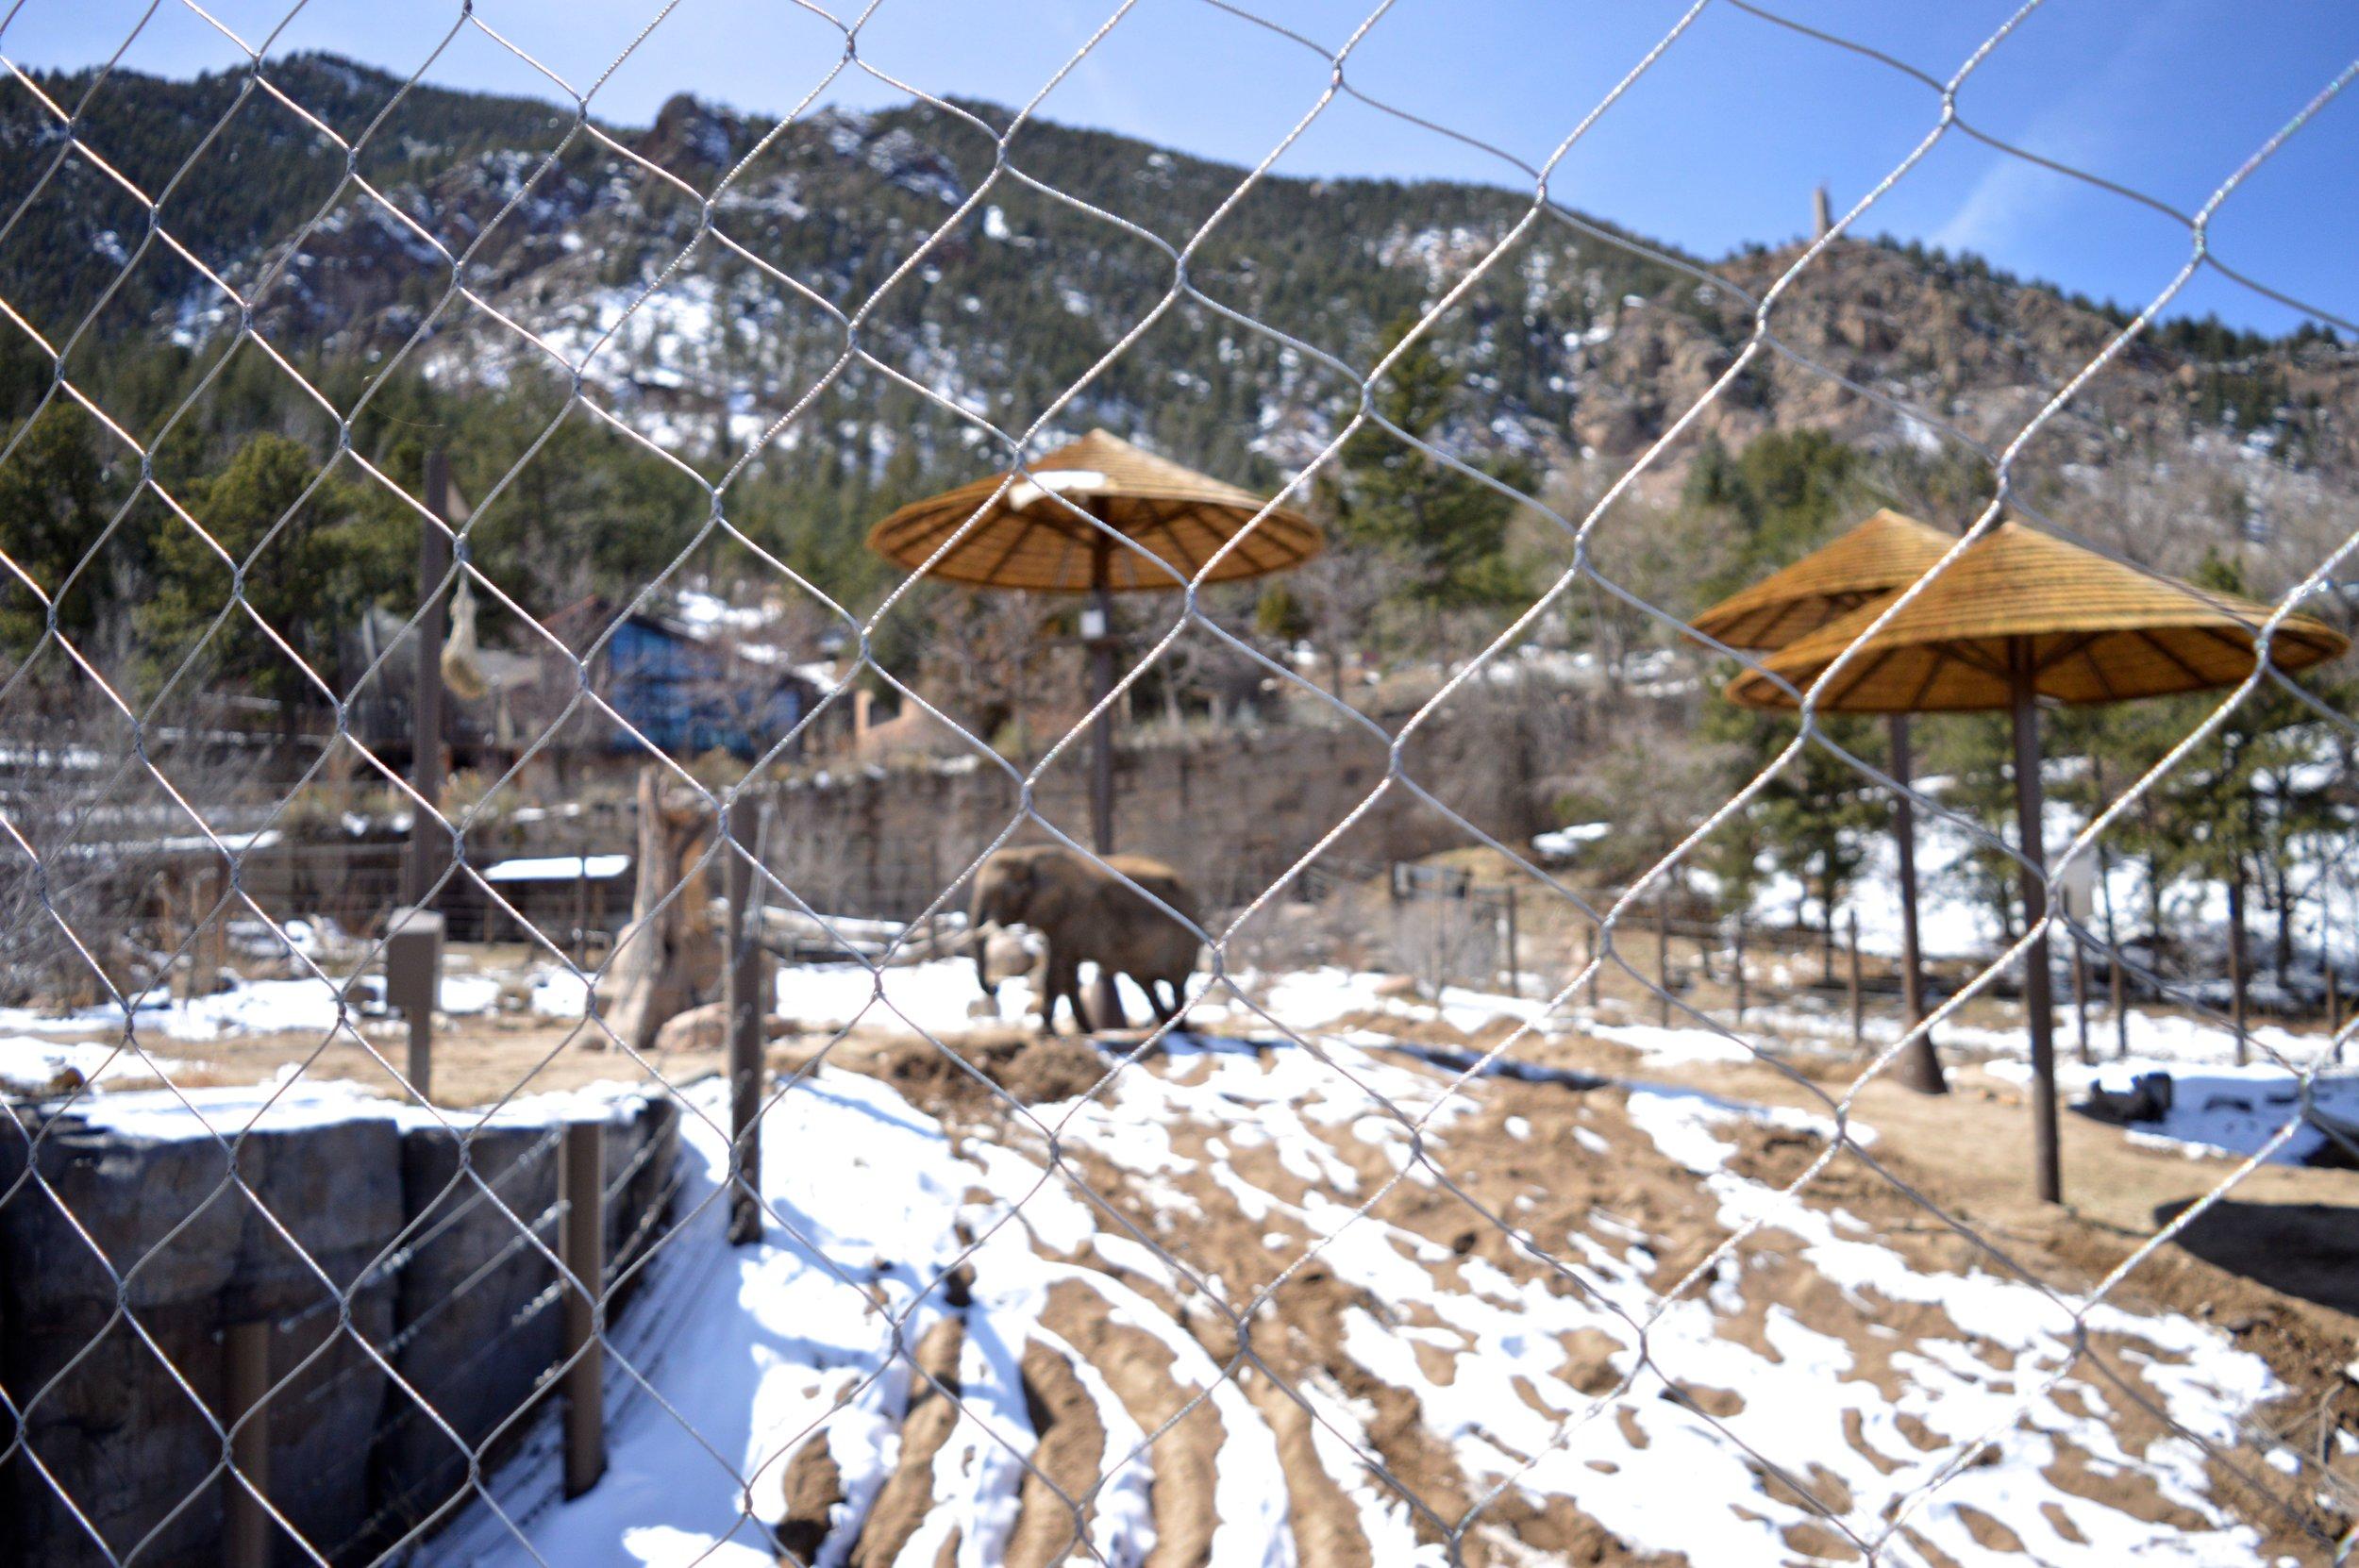 cheyenne-mountain-zoo-elephant-5.jpg